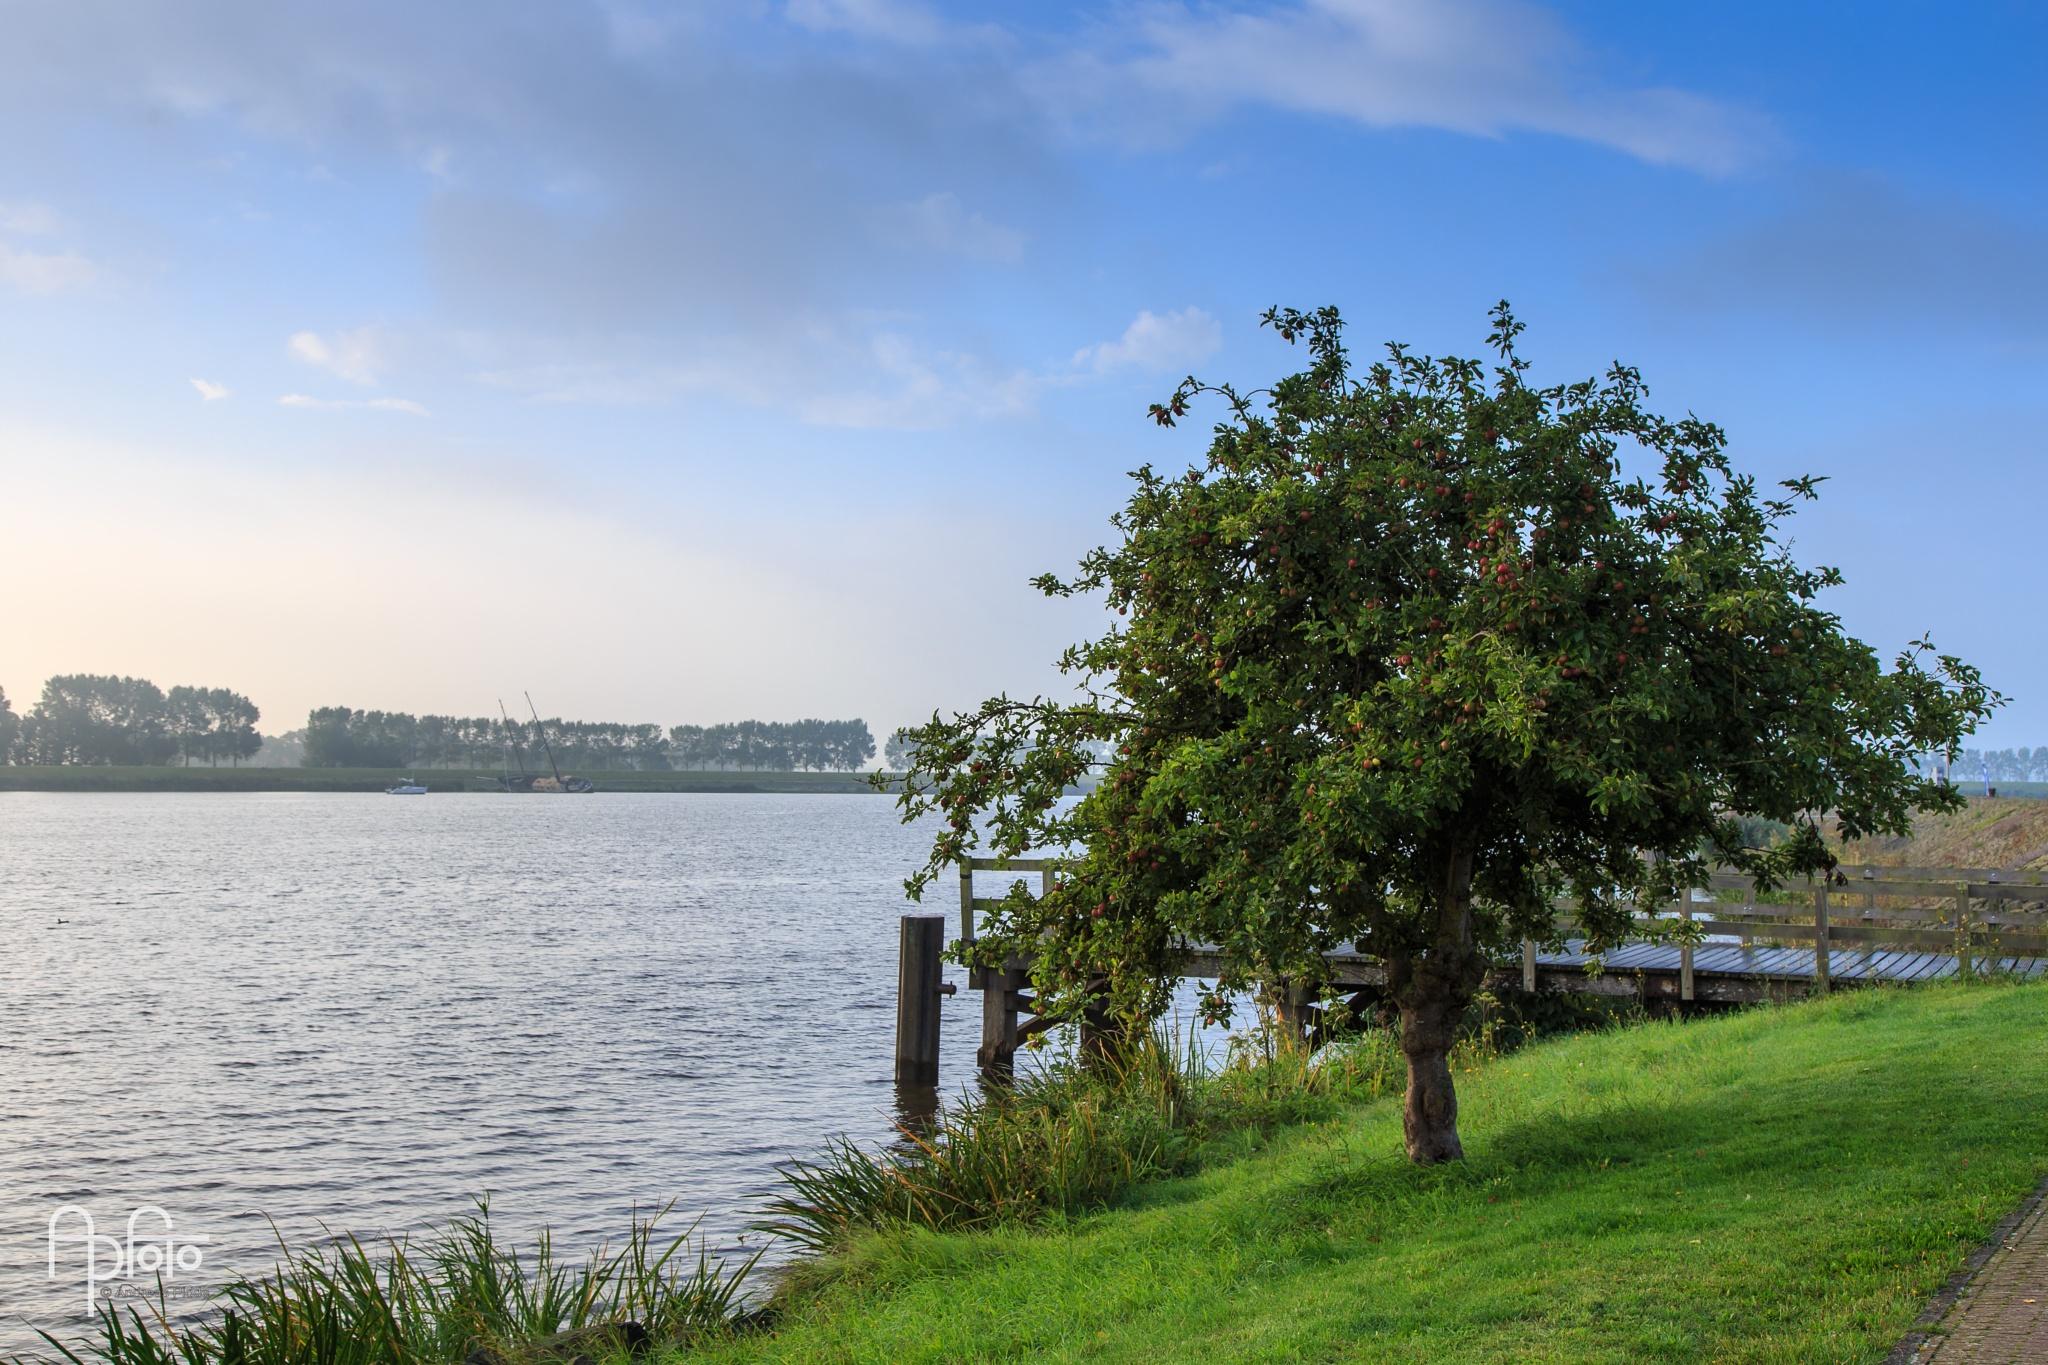 Tree at the Dam by Andreas Pidde